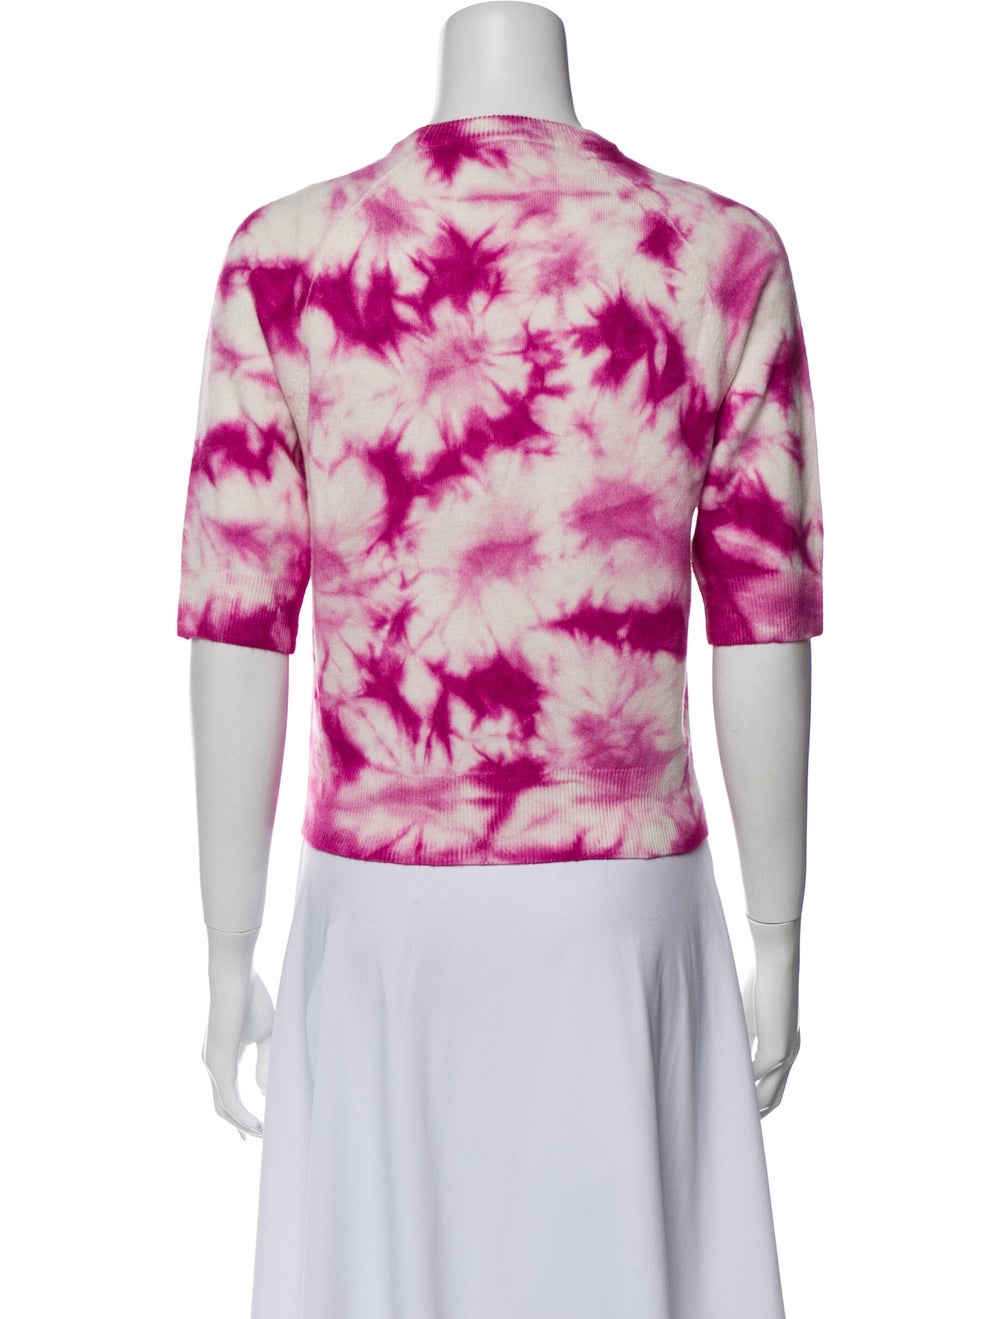 Michael Kors Cashmere Tie-Dye Print Sweater Pink - image 3